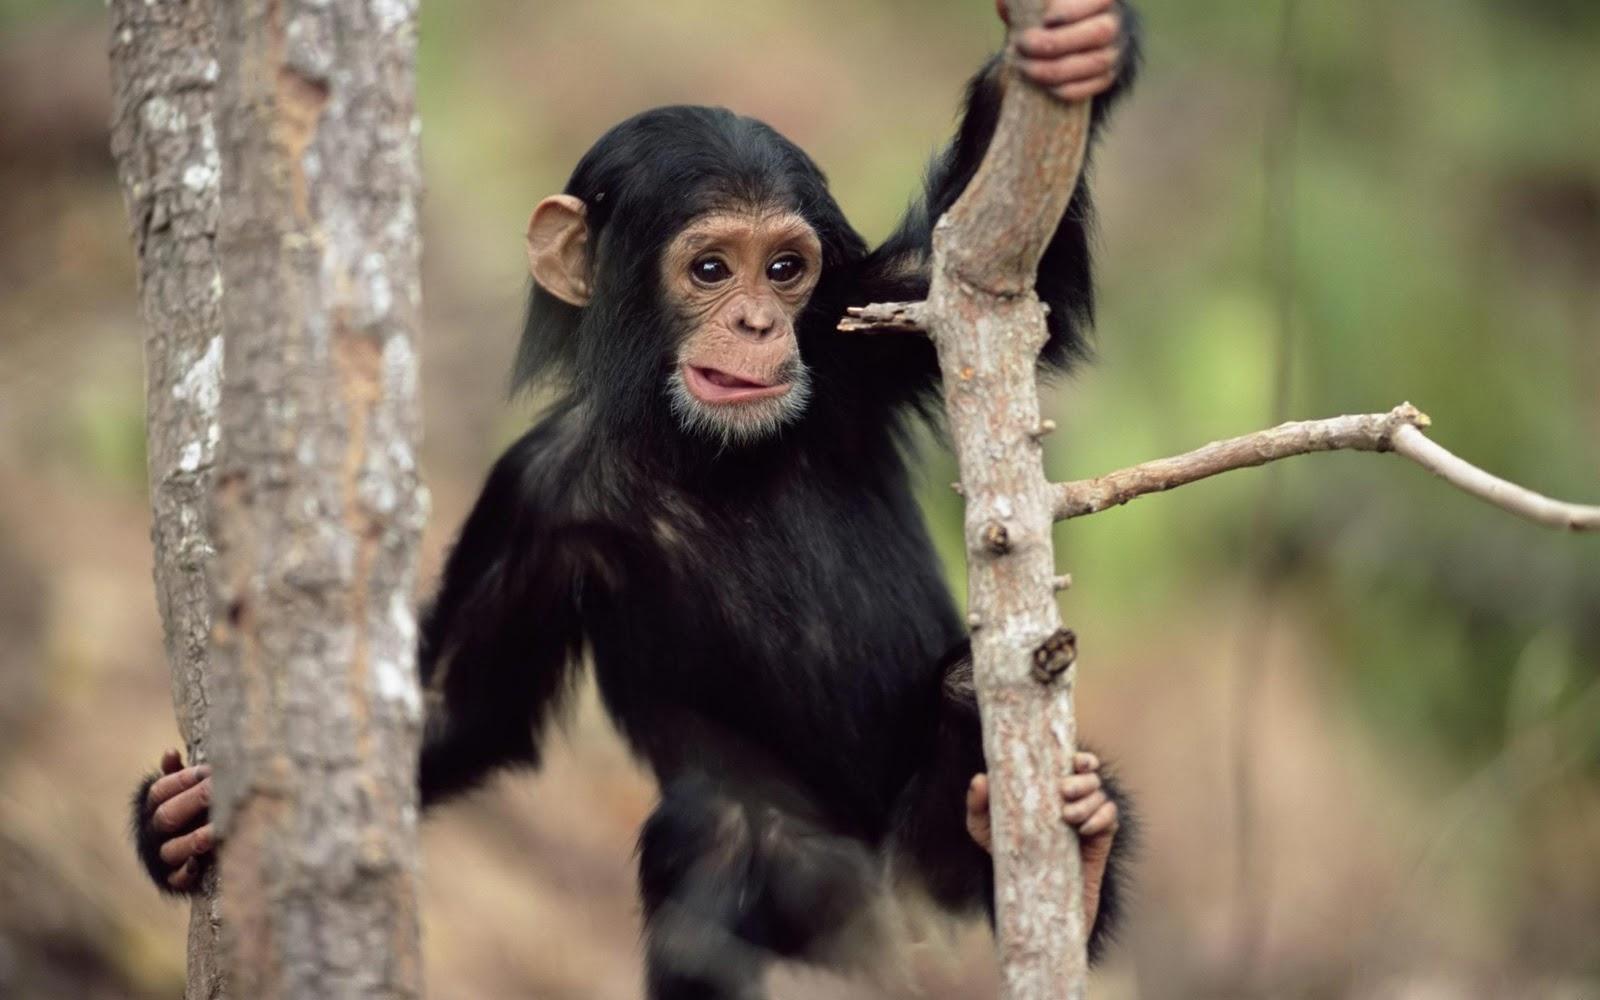 http://2.bp.blogspot.com/_Gi4plYyx3ww/TPqTsFHsTcI/AAAAAAAAAPw/J59jgSICwTY/s1600/Young_chimpanzee_High_definition_wallpaper.jpg